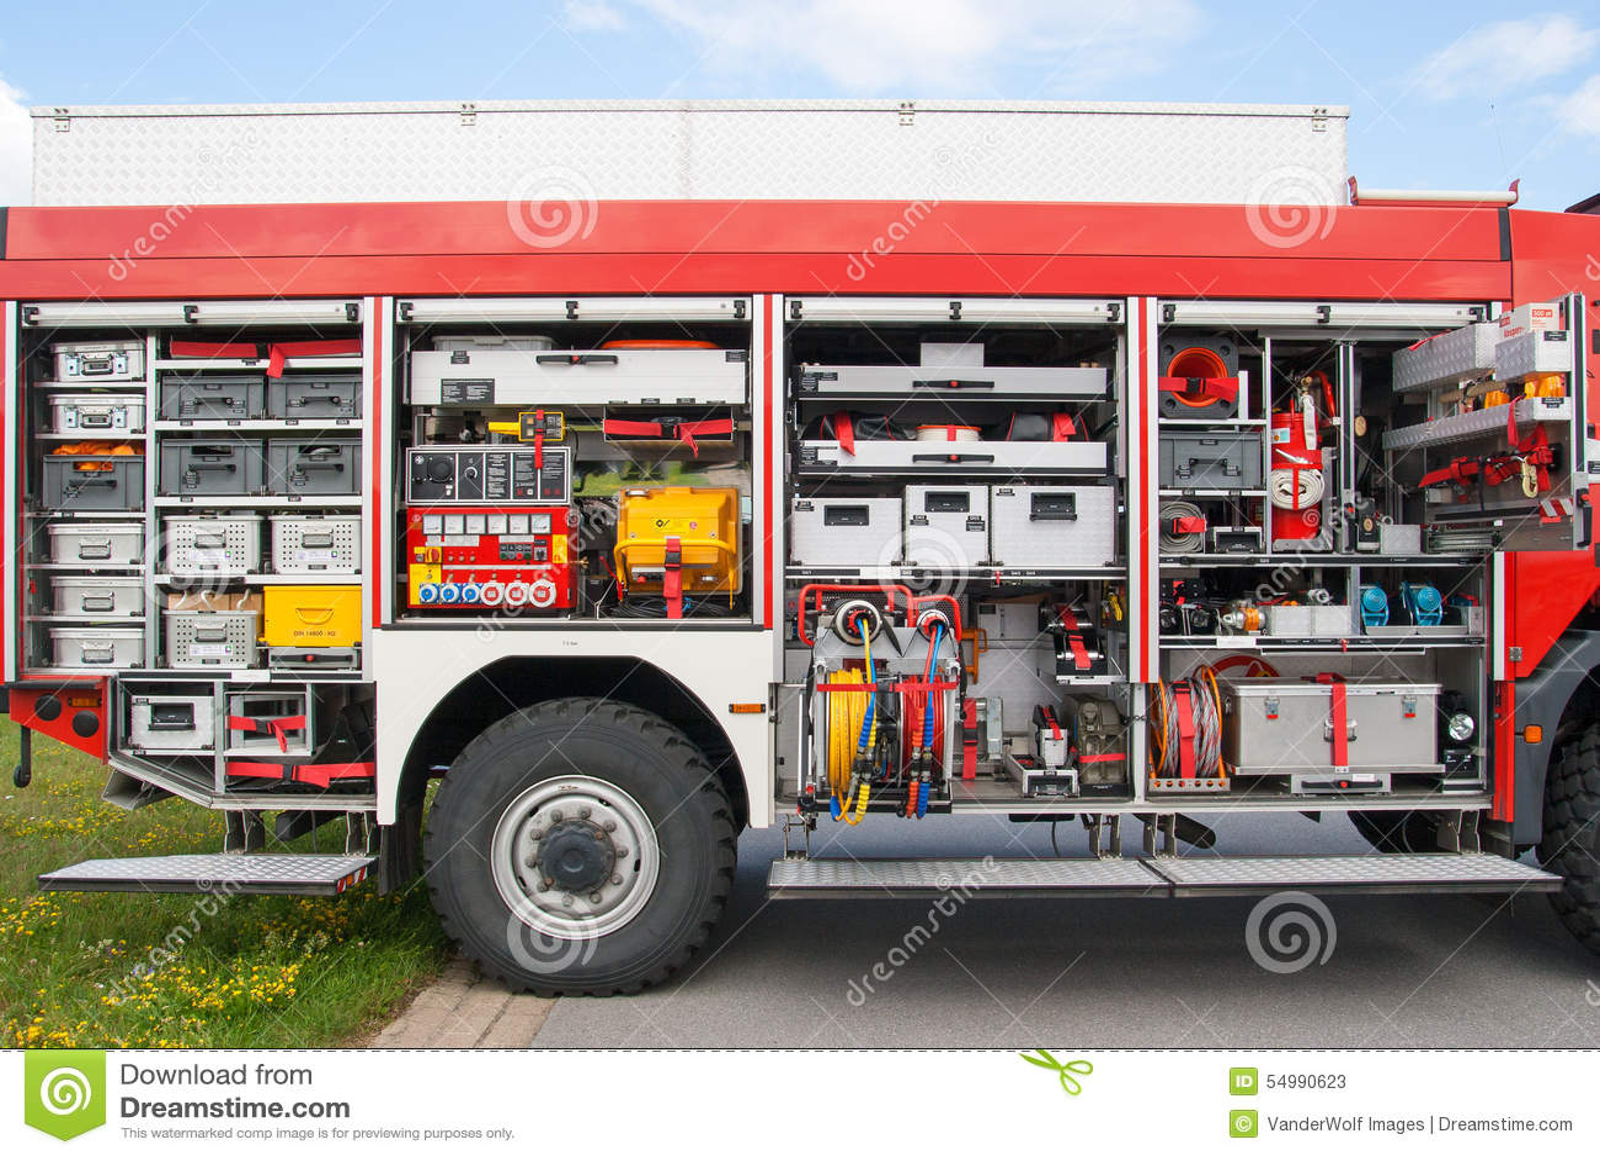 Firetruckutrustning